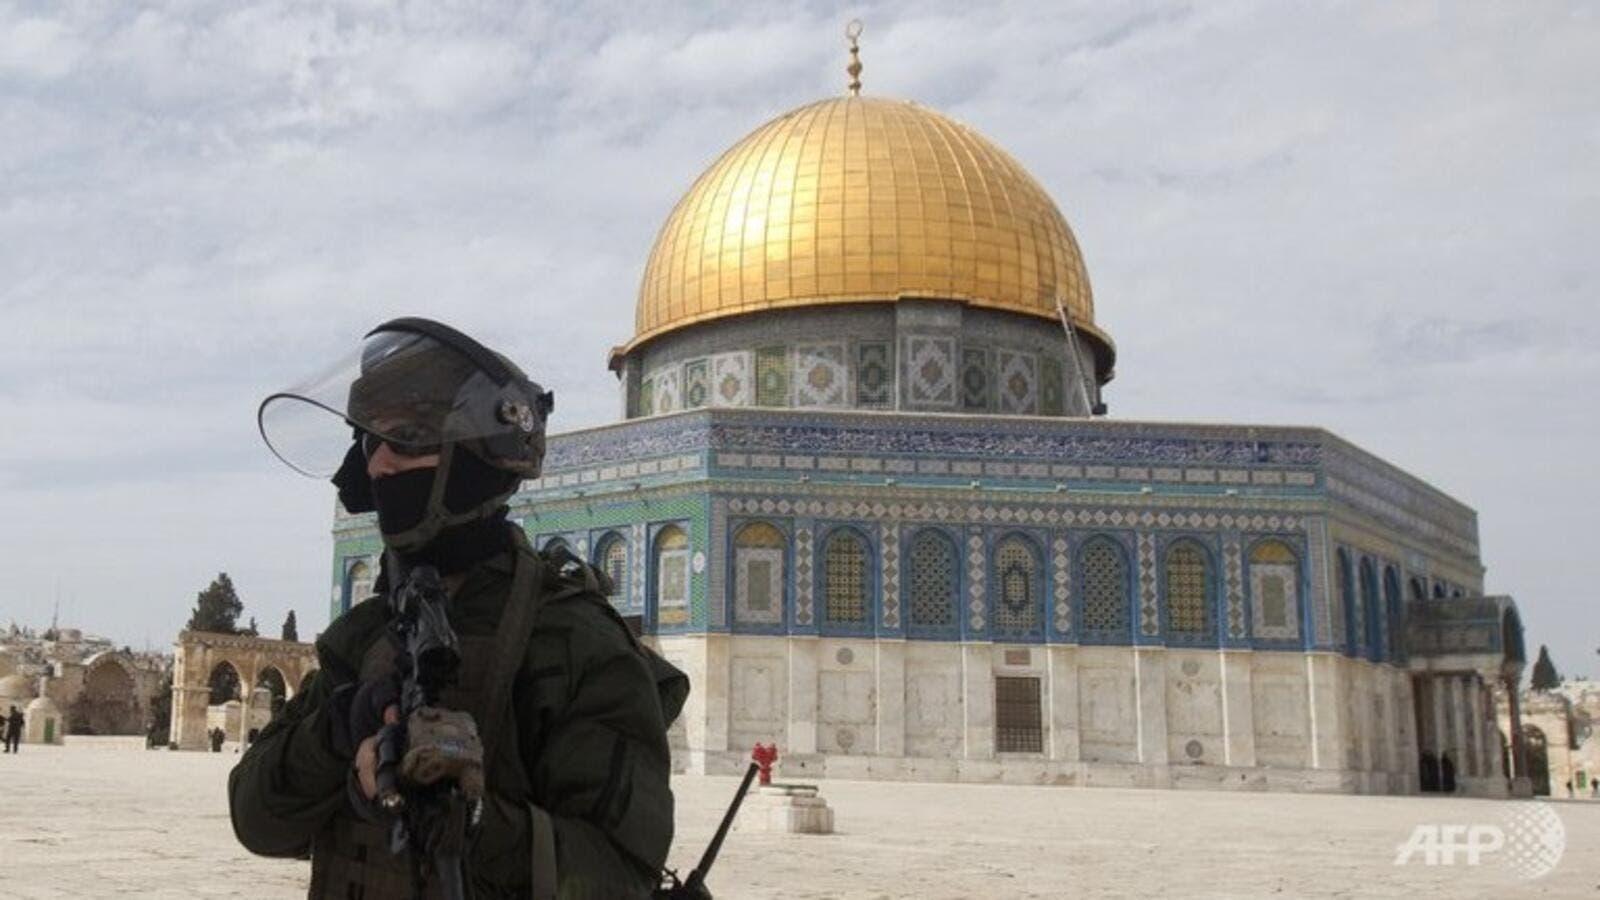 Jerusalem: Israeli police fire stun guns at Palestinian